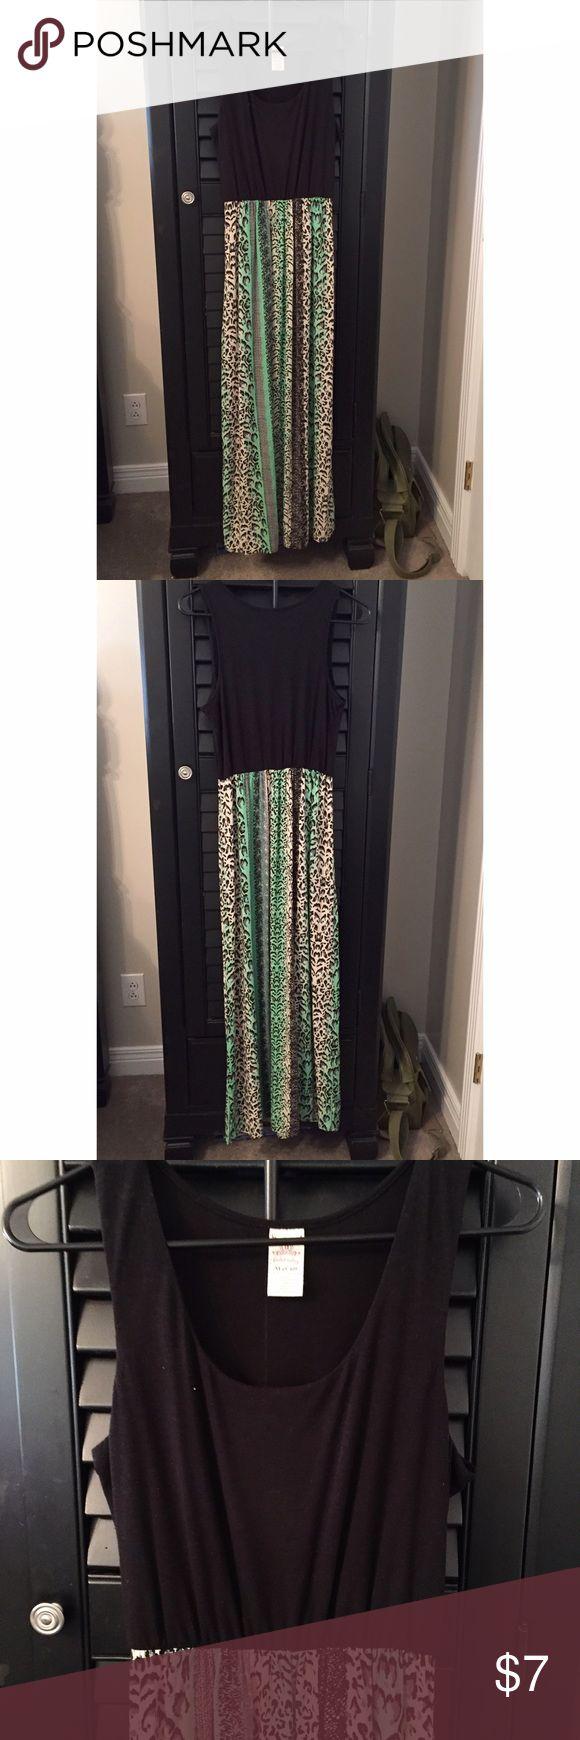 Faded Glory Black and Green Leopard Maxi Dress Faded Glory Black and Green Leopard Print Maxi Dress   Size M (Fits 8-10) Faded Glory Dresses Maxi